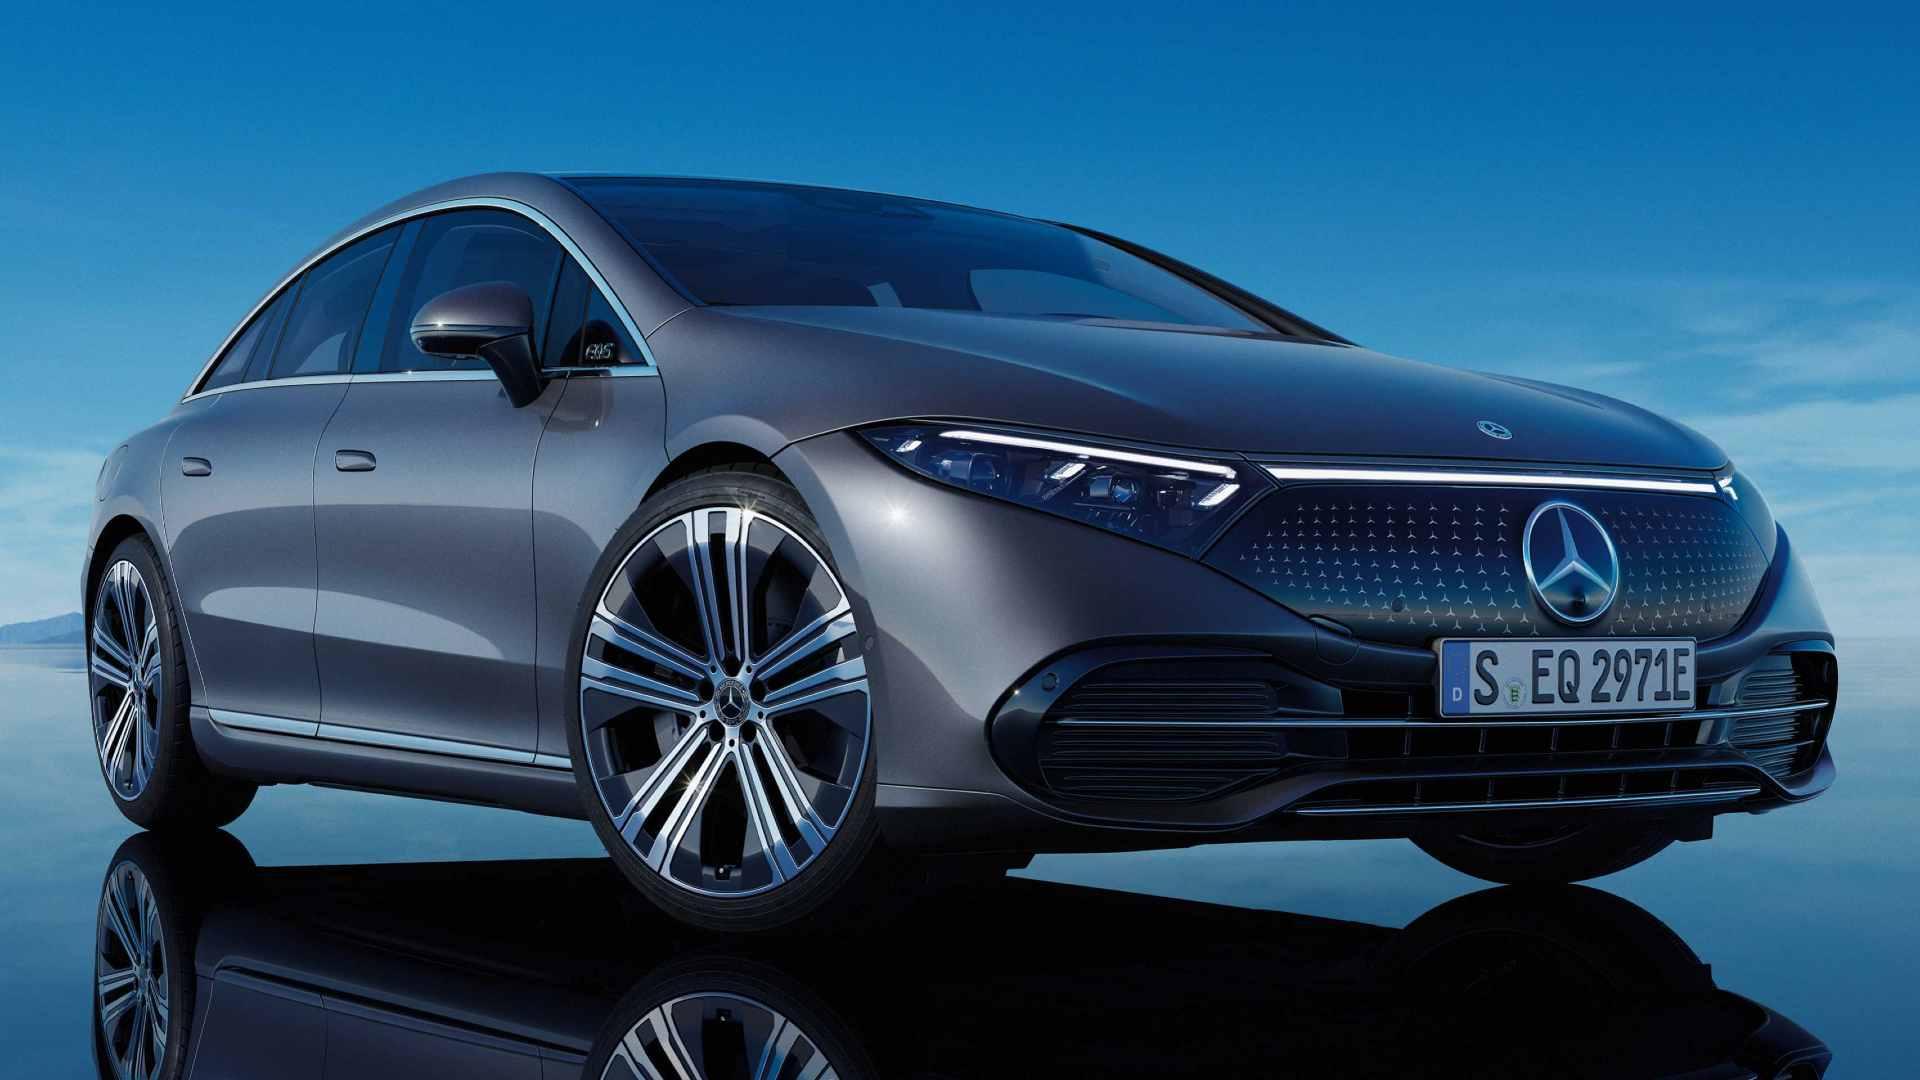 Mercedes-Benz EQS electric sedan makes global debut, has a range of up to 770 kilometres- Technology News, Gadgetclock